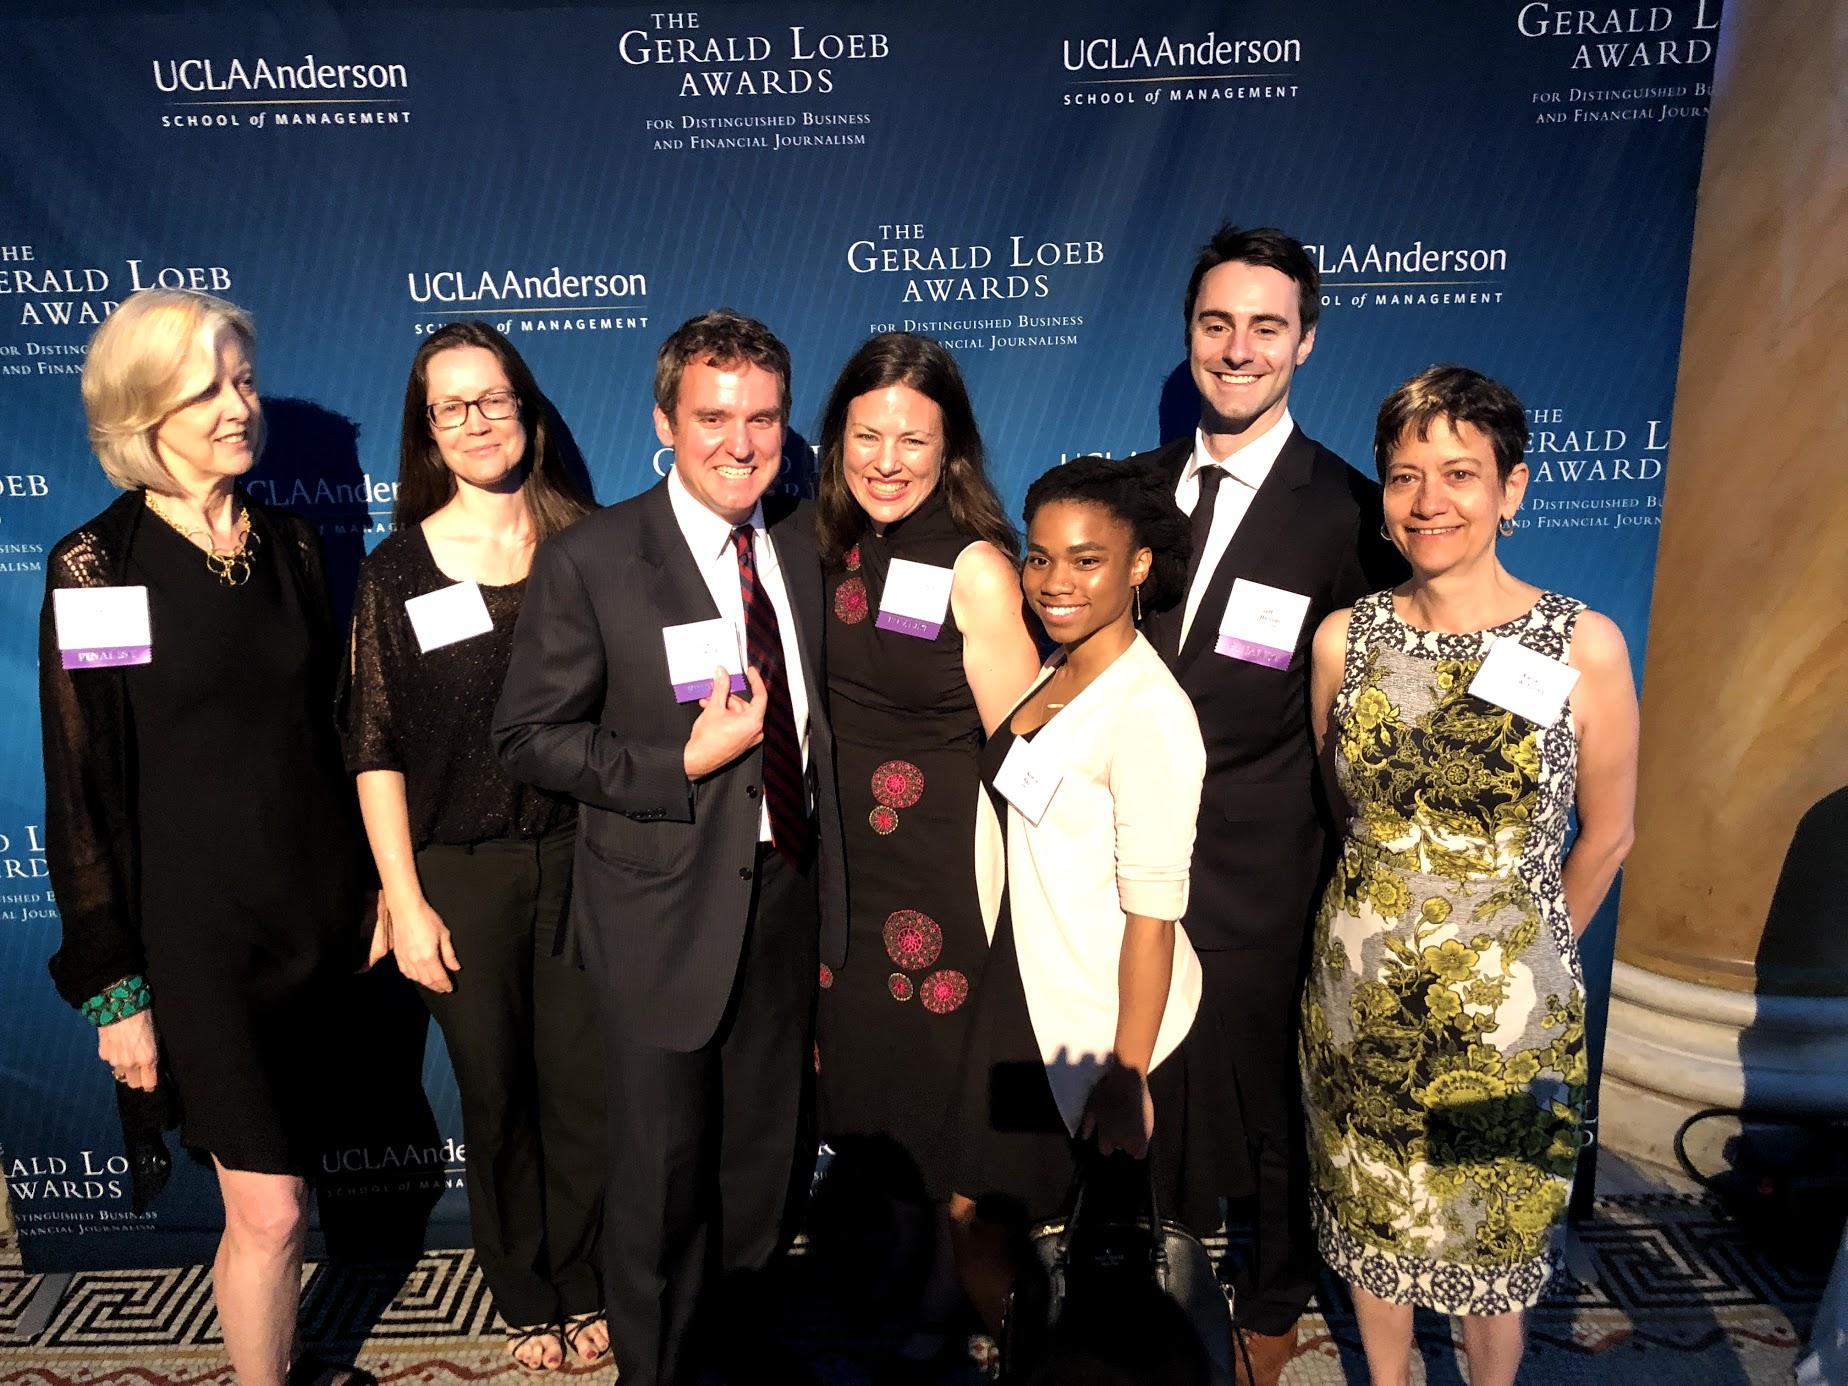 Quartz editorial staff at the Gerald Loeb Awards in 2019